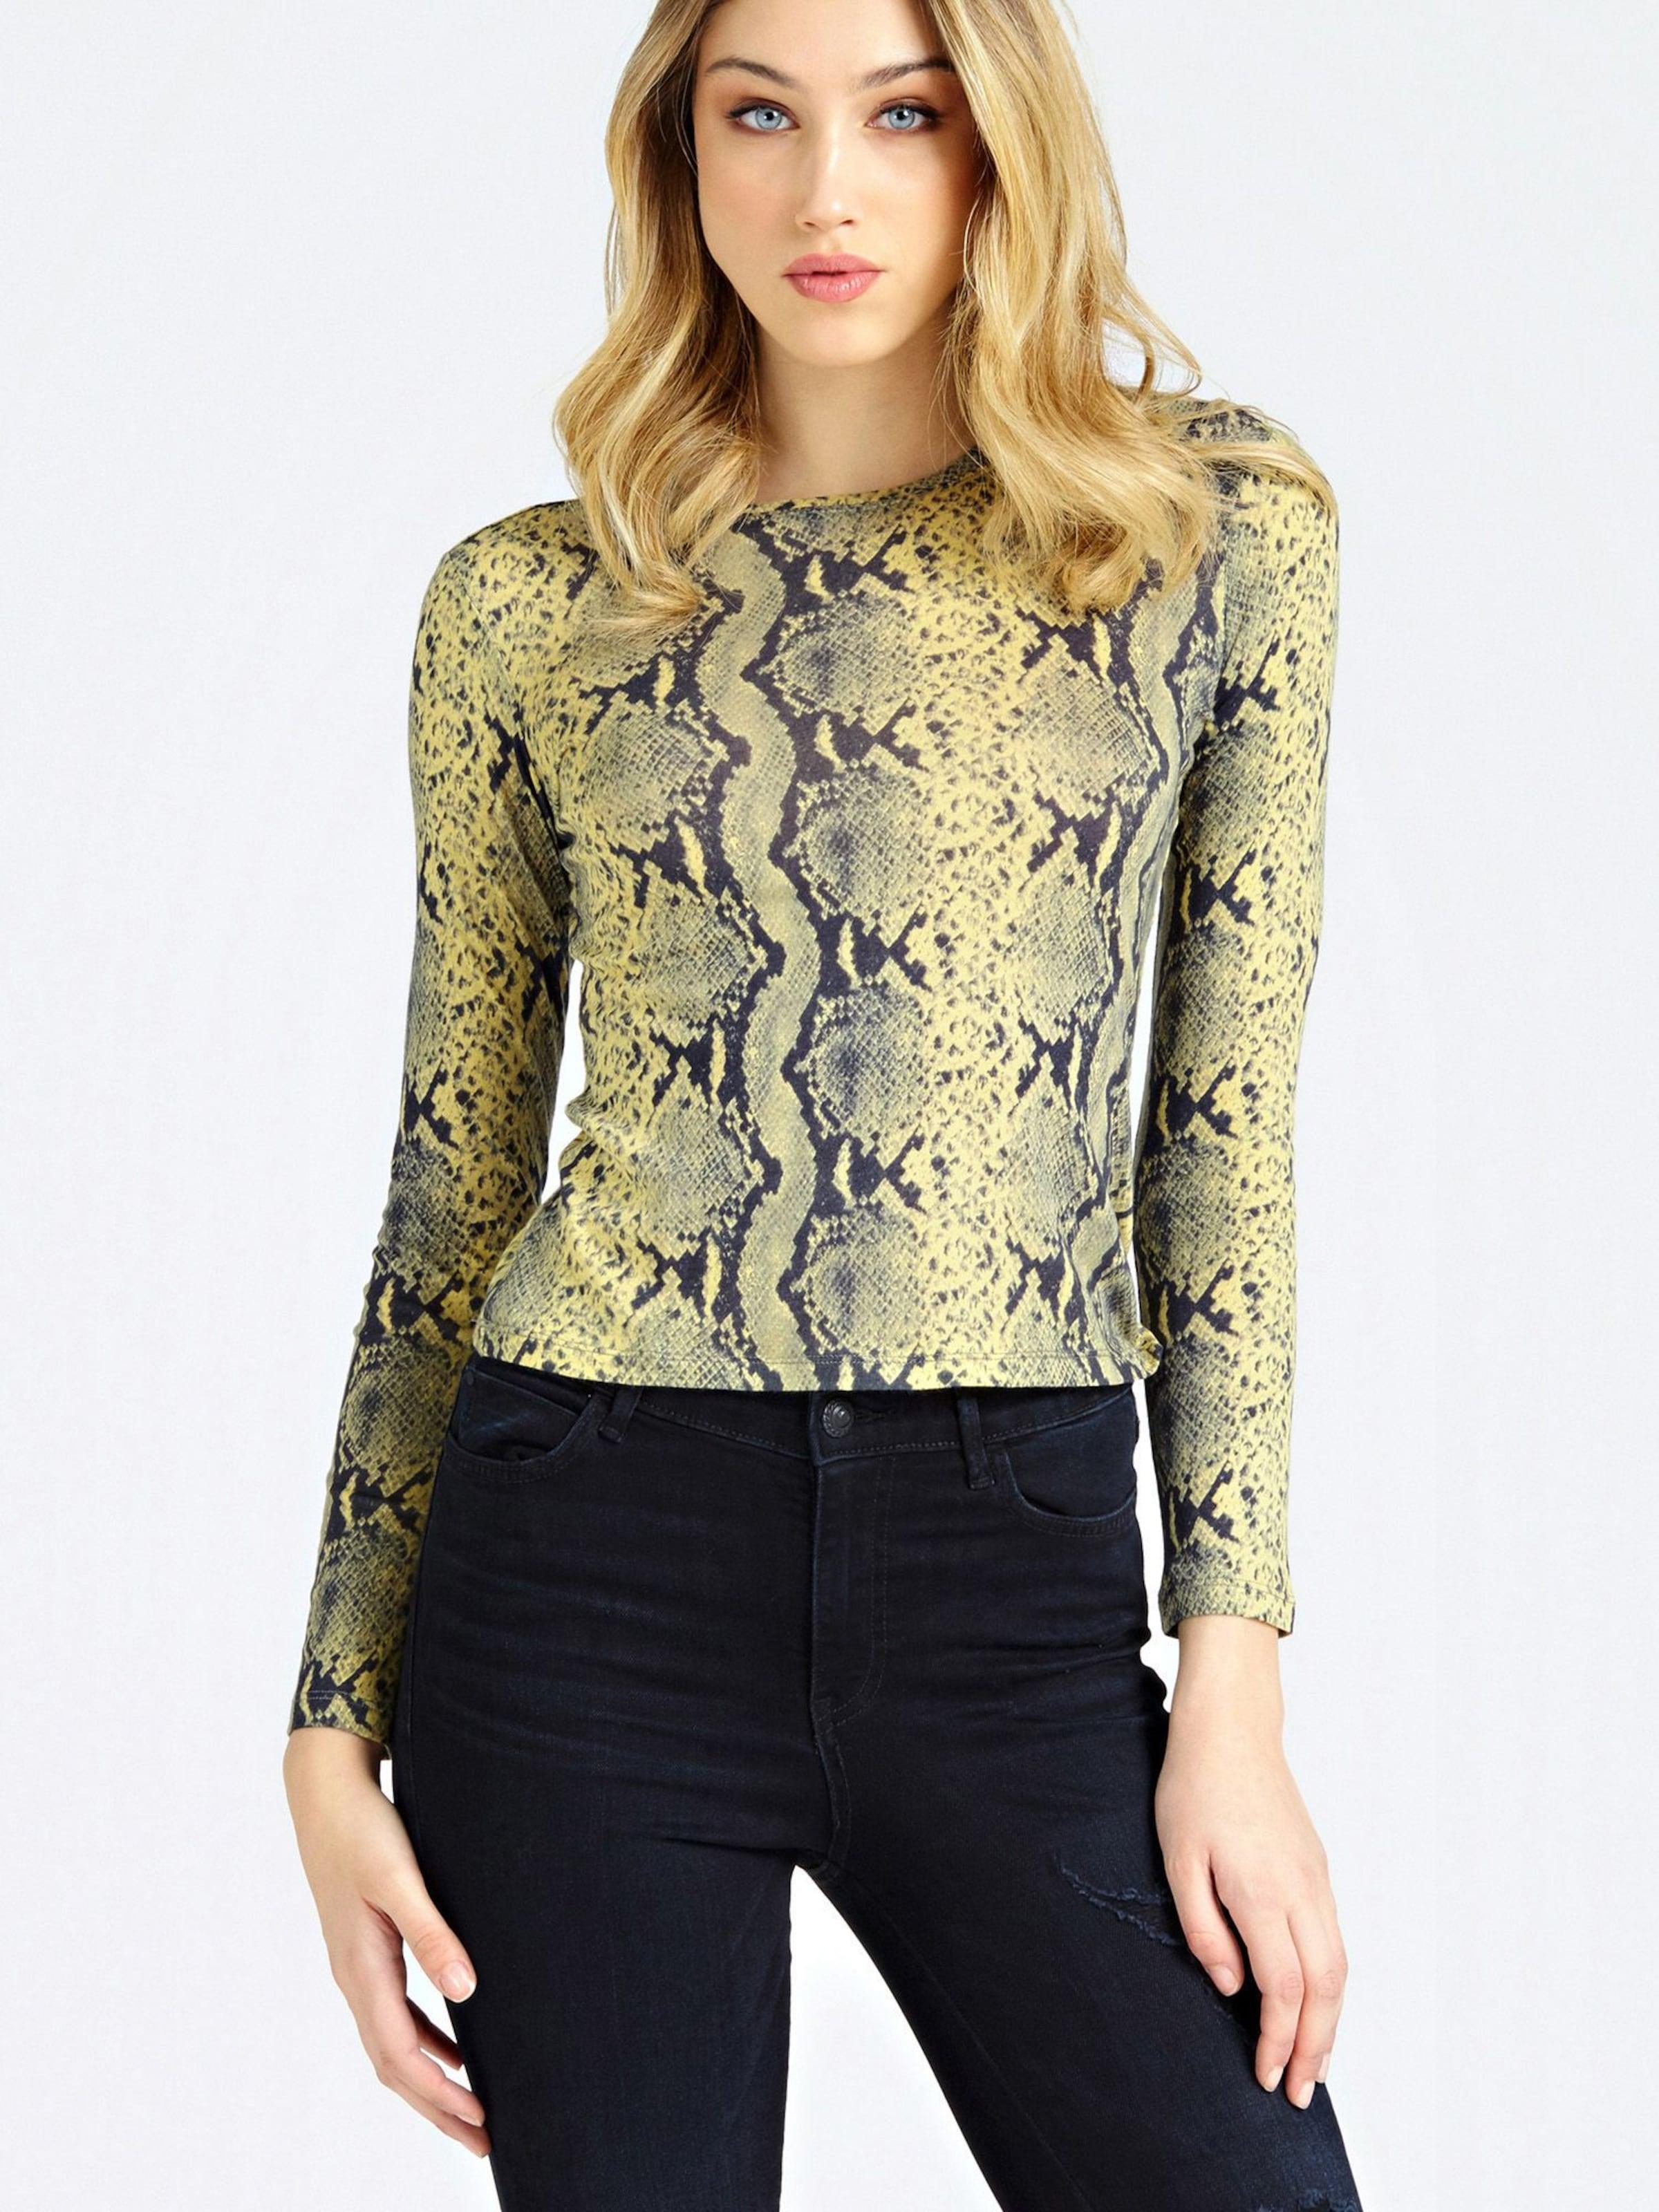 Guess In GoldgelbOliv Shirt Shirt Guess If7vb6gyYm